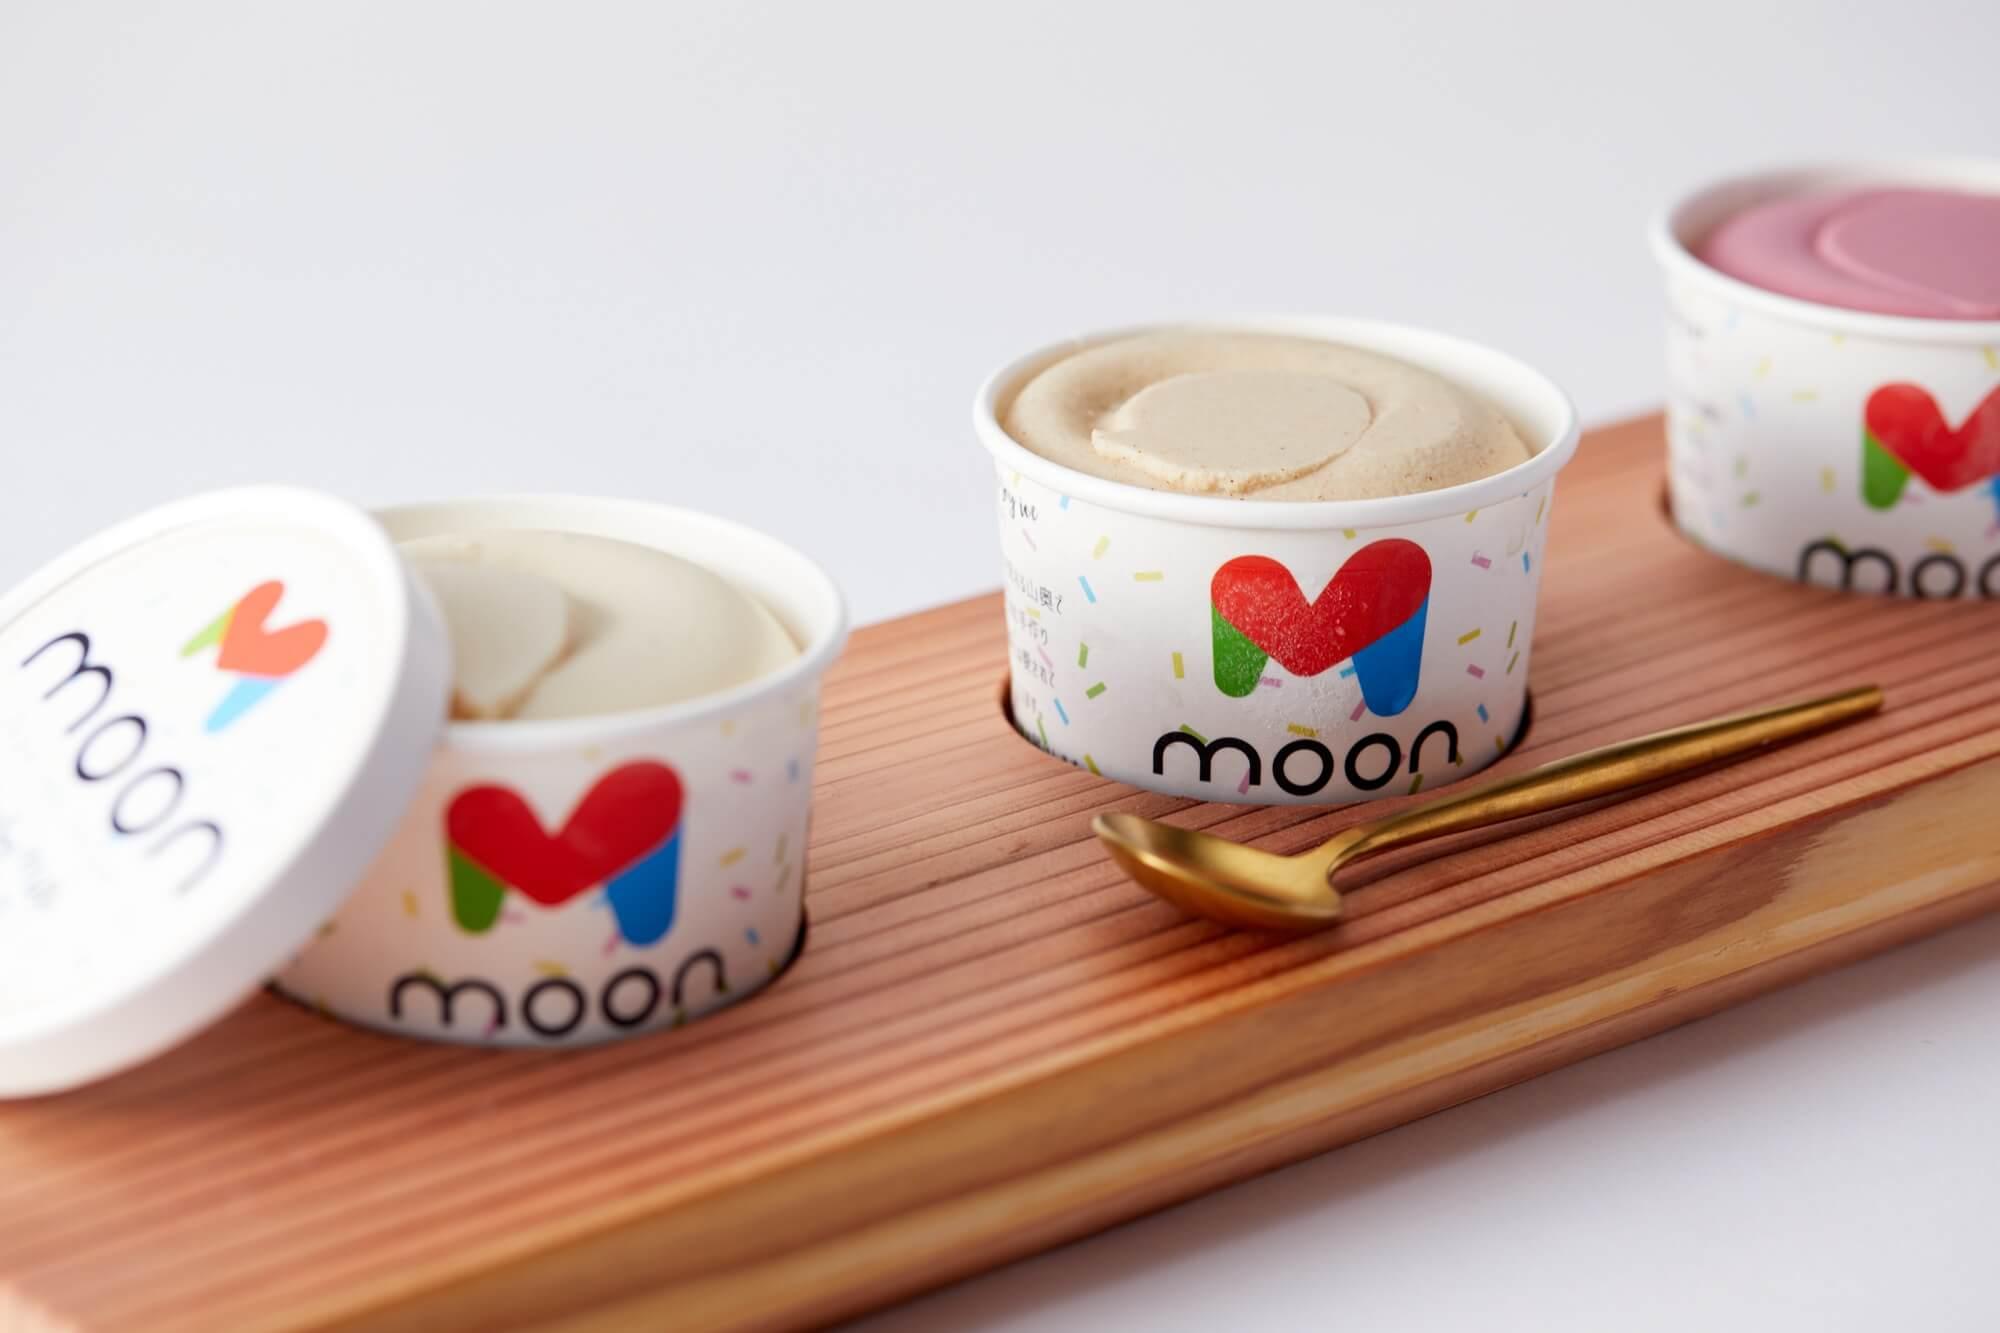 MOON FOOD JAPANの豆乳アイス